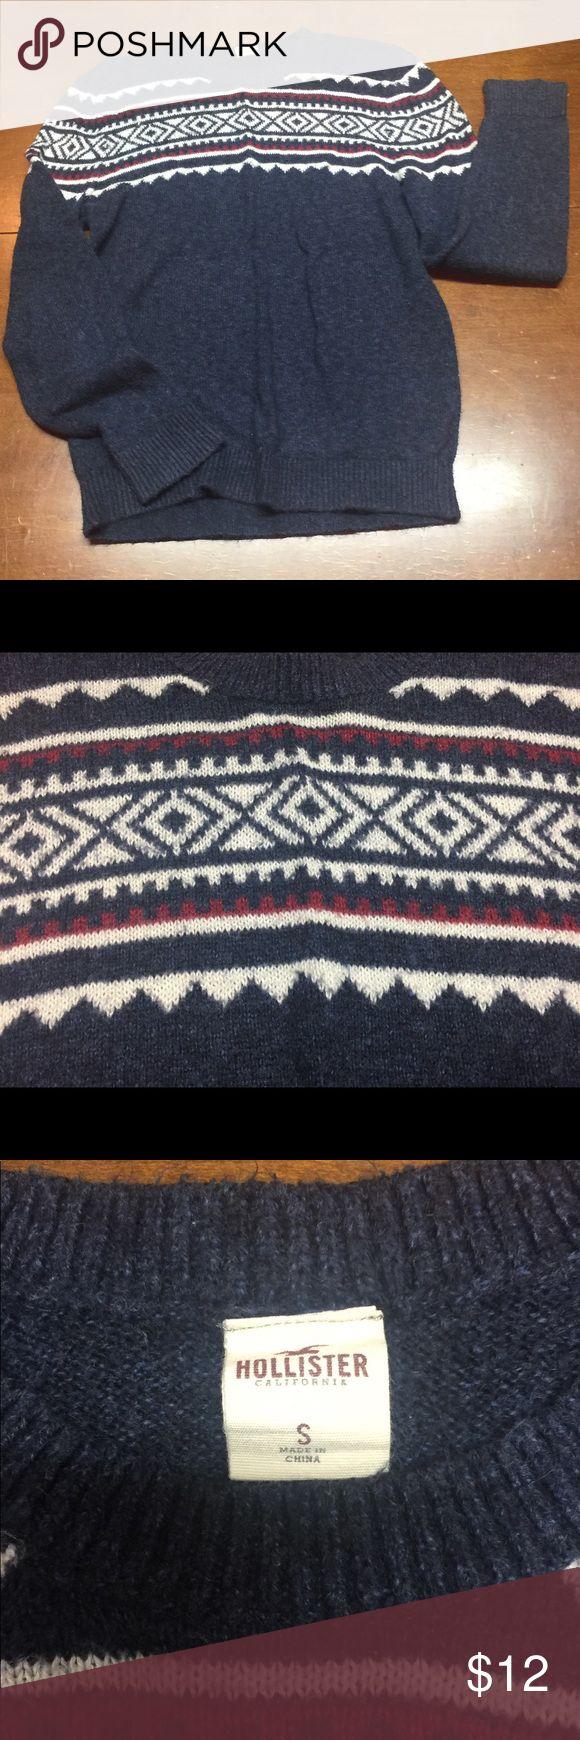 Men's Small Hollister Sweater Men's Small Hollister Sweater. Size Small. Blue, white, red. Hollister Sweaters Crewneck